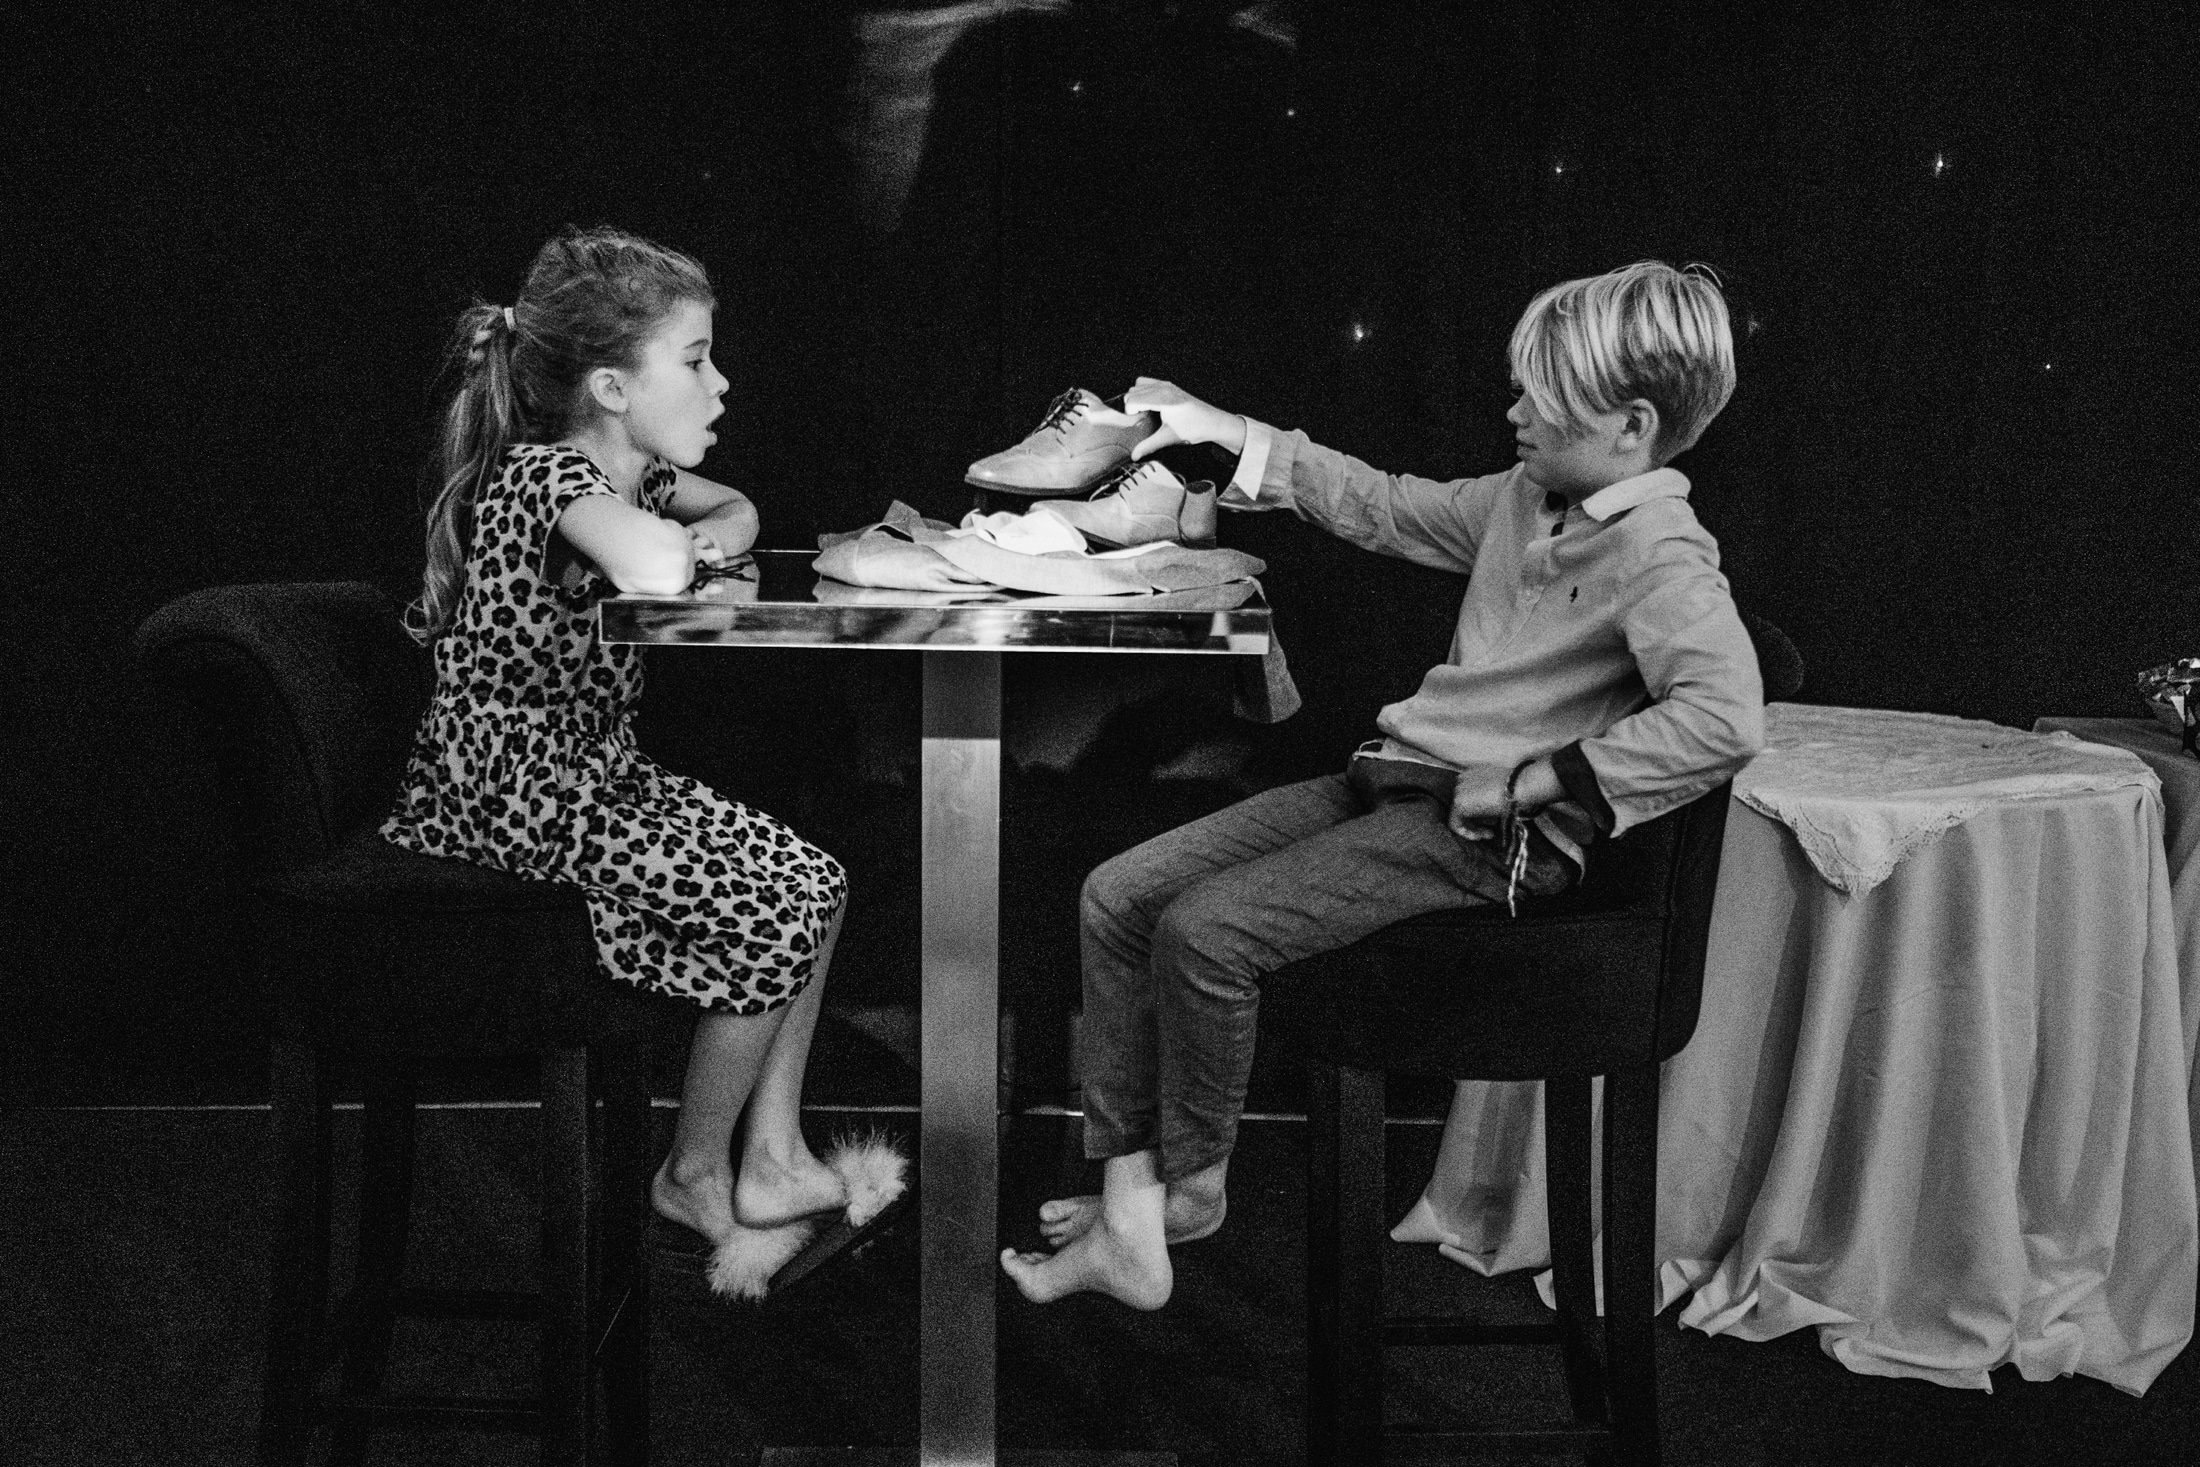 children sitting on stools next to dance floor